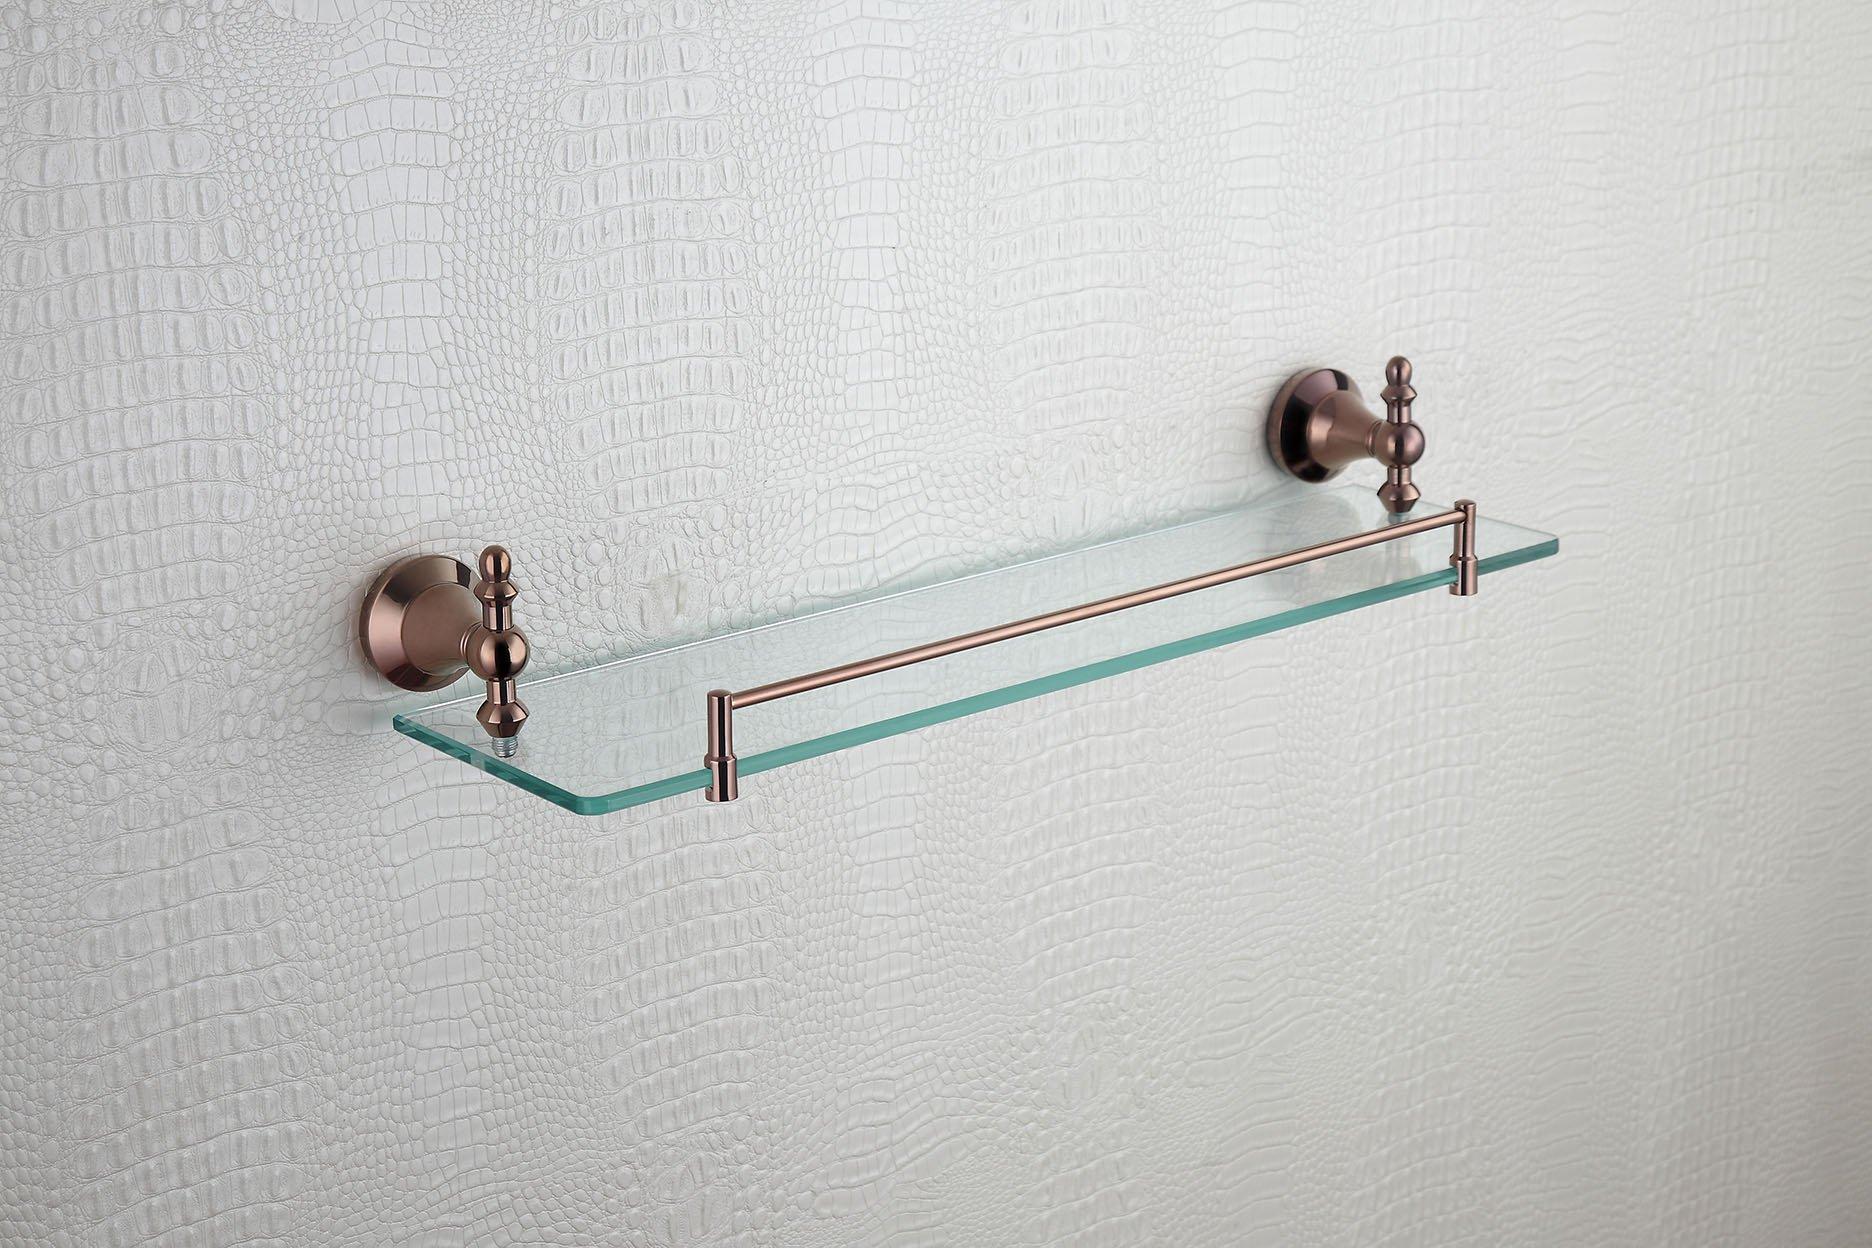 Cloud Power Stylish Rose Gold Color Bathroom Brass Single Glass Shelves Single Glass Shelves With Titanium Wall-mounted Single Glass Shelves